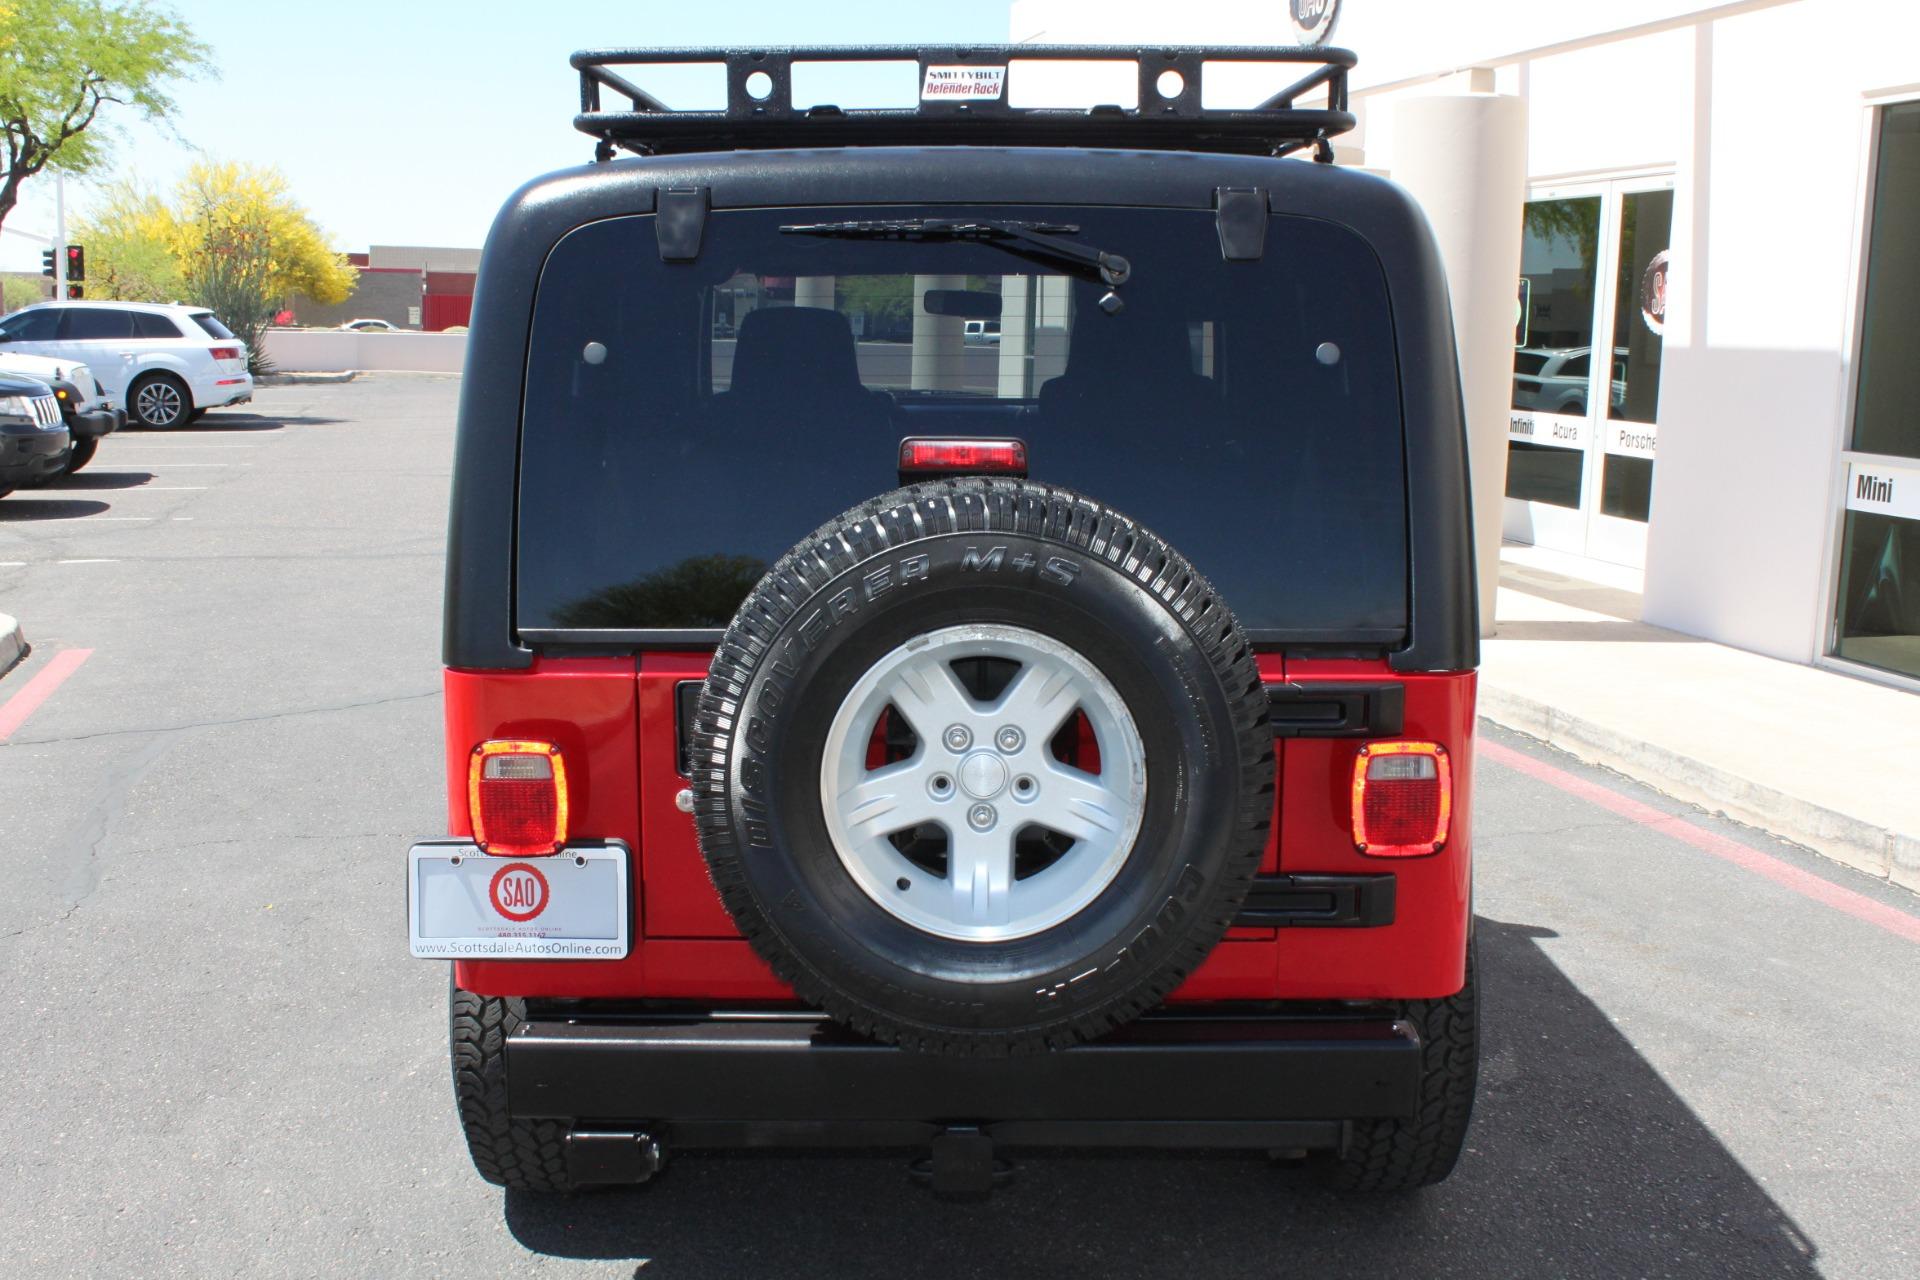 Used-2006-Jeep-Wrangler-4X4-LJ-Unlimited-LWB-Mopar